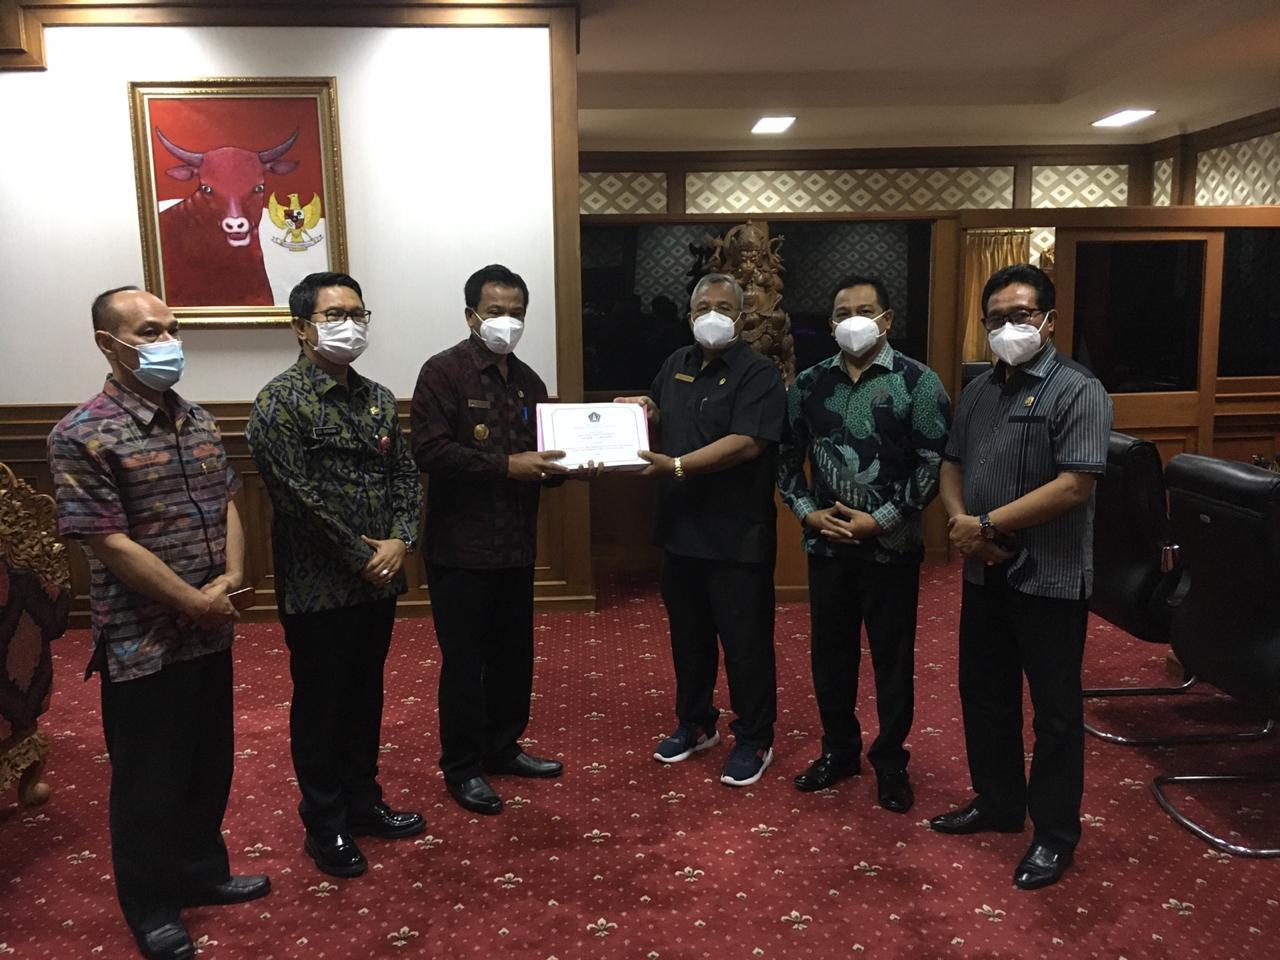 PIMPINAN DPRD Badung menerima dokumen RAPBD Badung tahun 2021 yang diserahkan Pjs. Bupati Badung, I Ketut Lihadnyana. Foto: ist